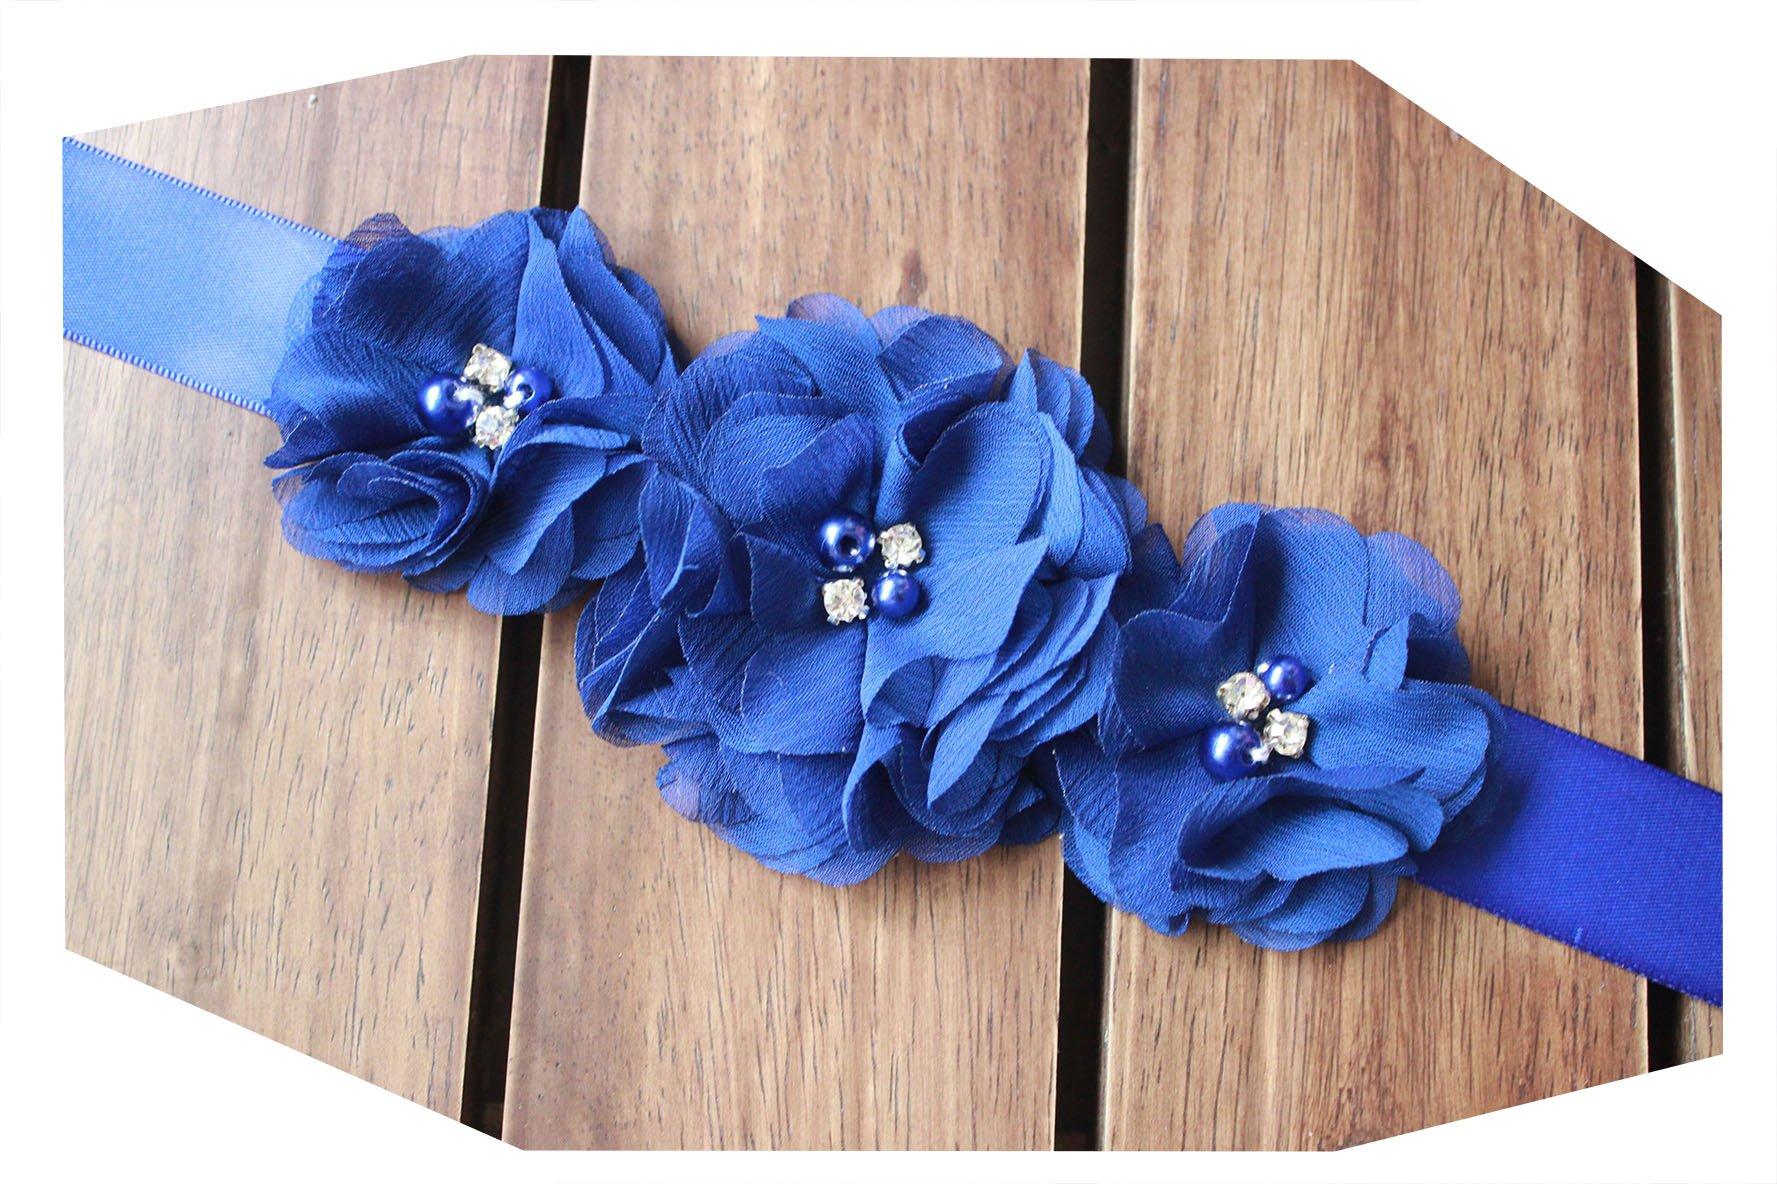 Bridesmaid and Flowergirls sashes wedding sash pearls flowers belts (Royal blue)